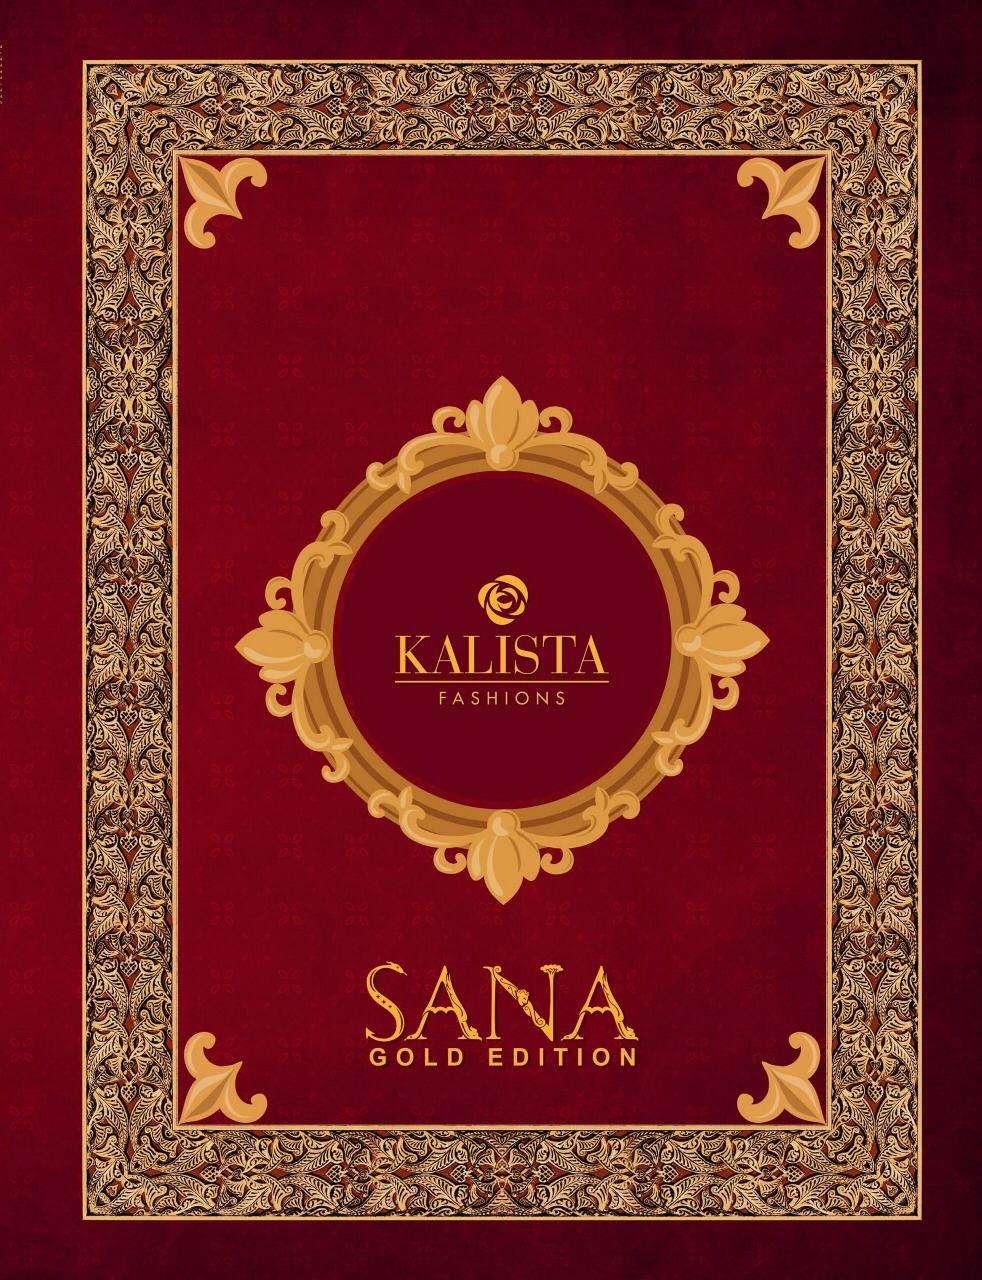 Kalista Sana Gold Edition Party Wear Wedding Sarees